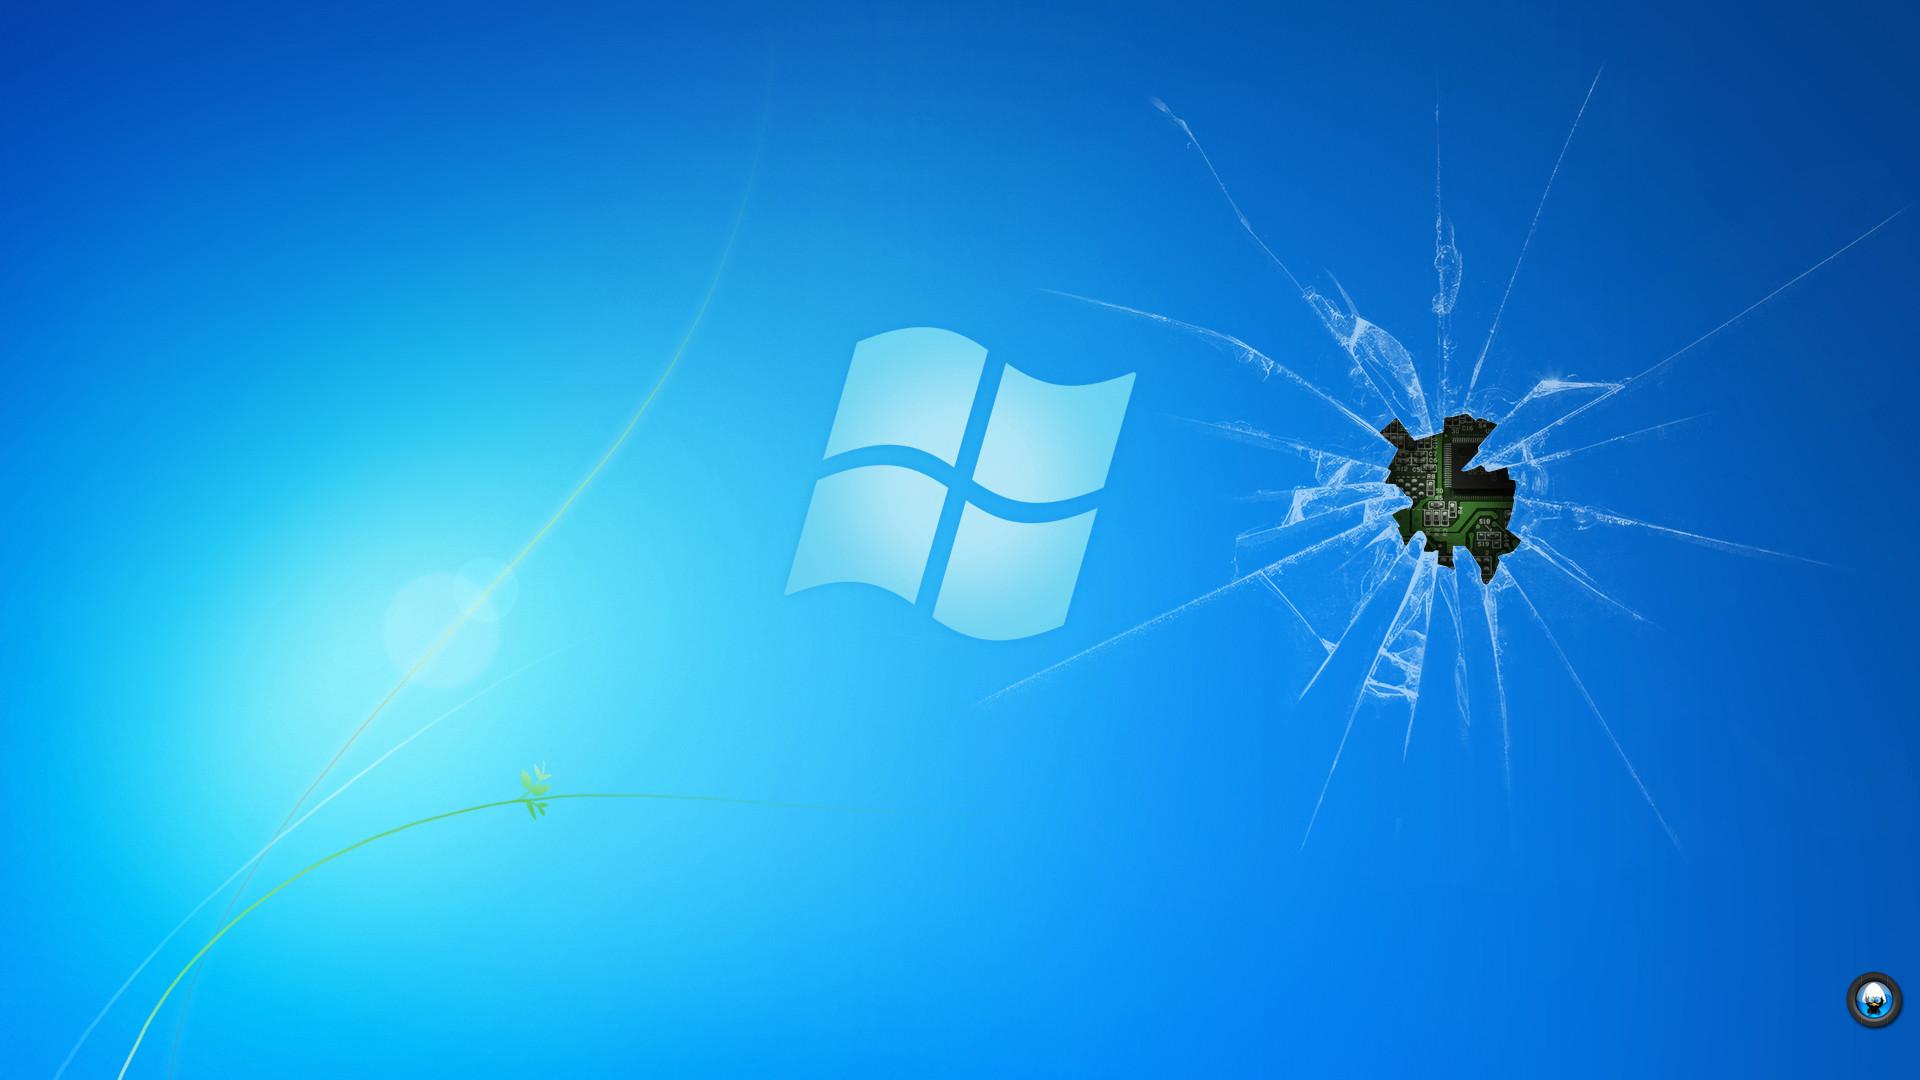 Creeper Broken Screen: Cracked Computer Wallpaper (72+ Images